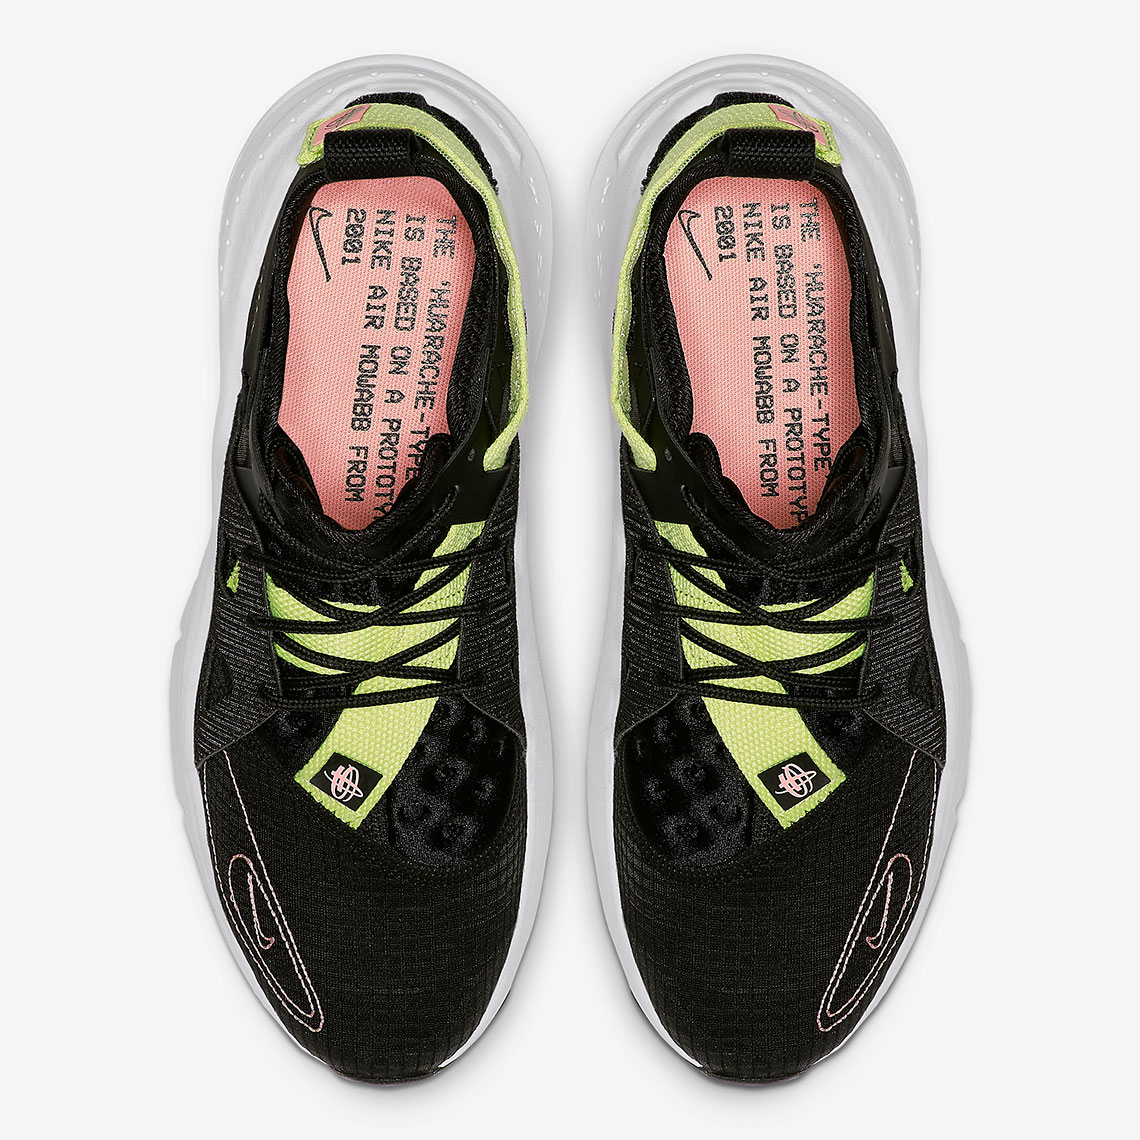 Nike Huarache Type N.354 Black Pink Yellow BQ5102-001 ...